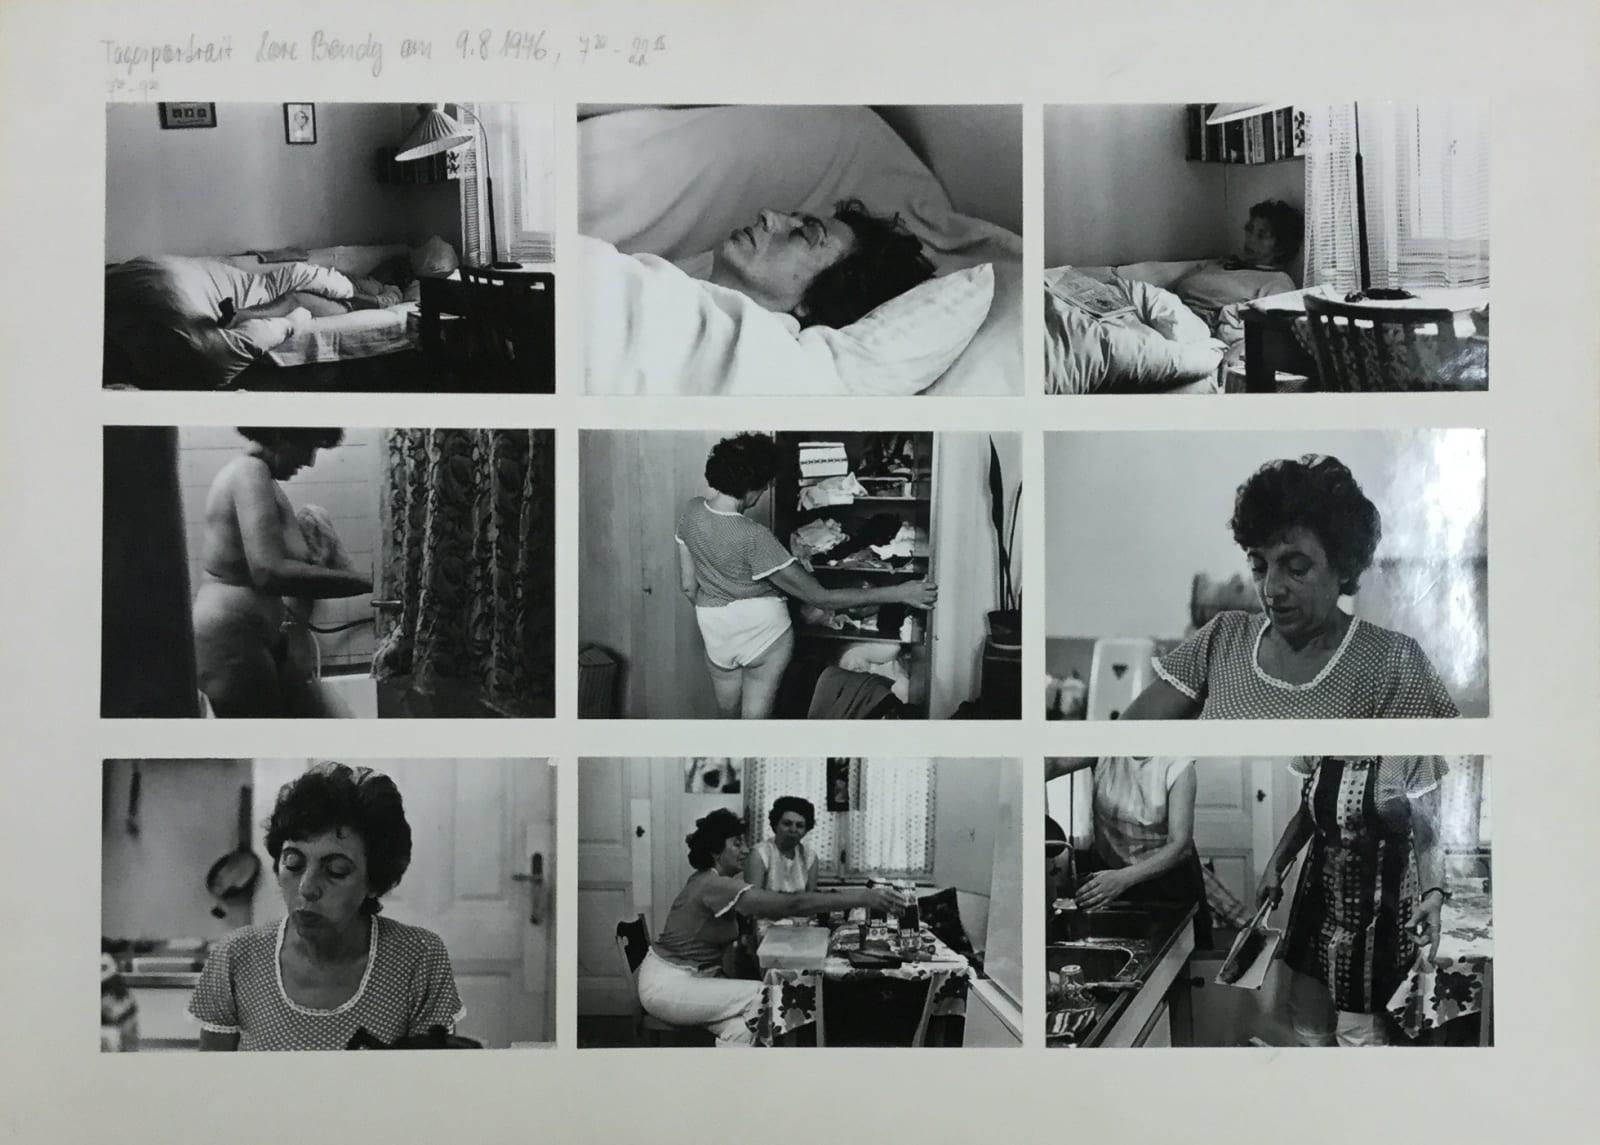 Friedl KUBELKA Tagesportrait: Lore Bondy am 9.8.1976, 7:30 - 22:15, 1976 61 vintage gelatin silver prints mounted on 7 sheets of card Each sheet: 32 x 44 cm